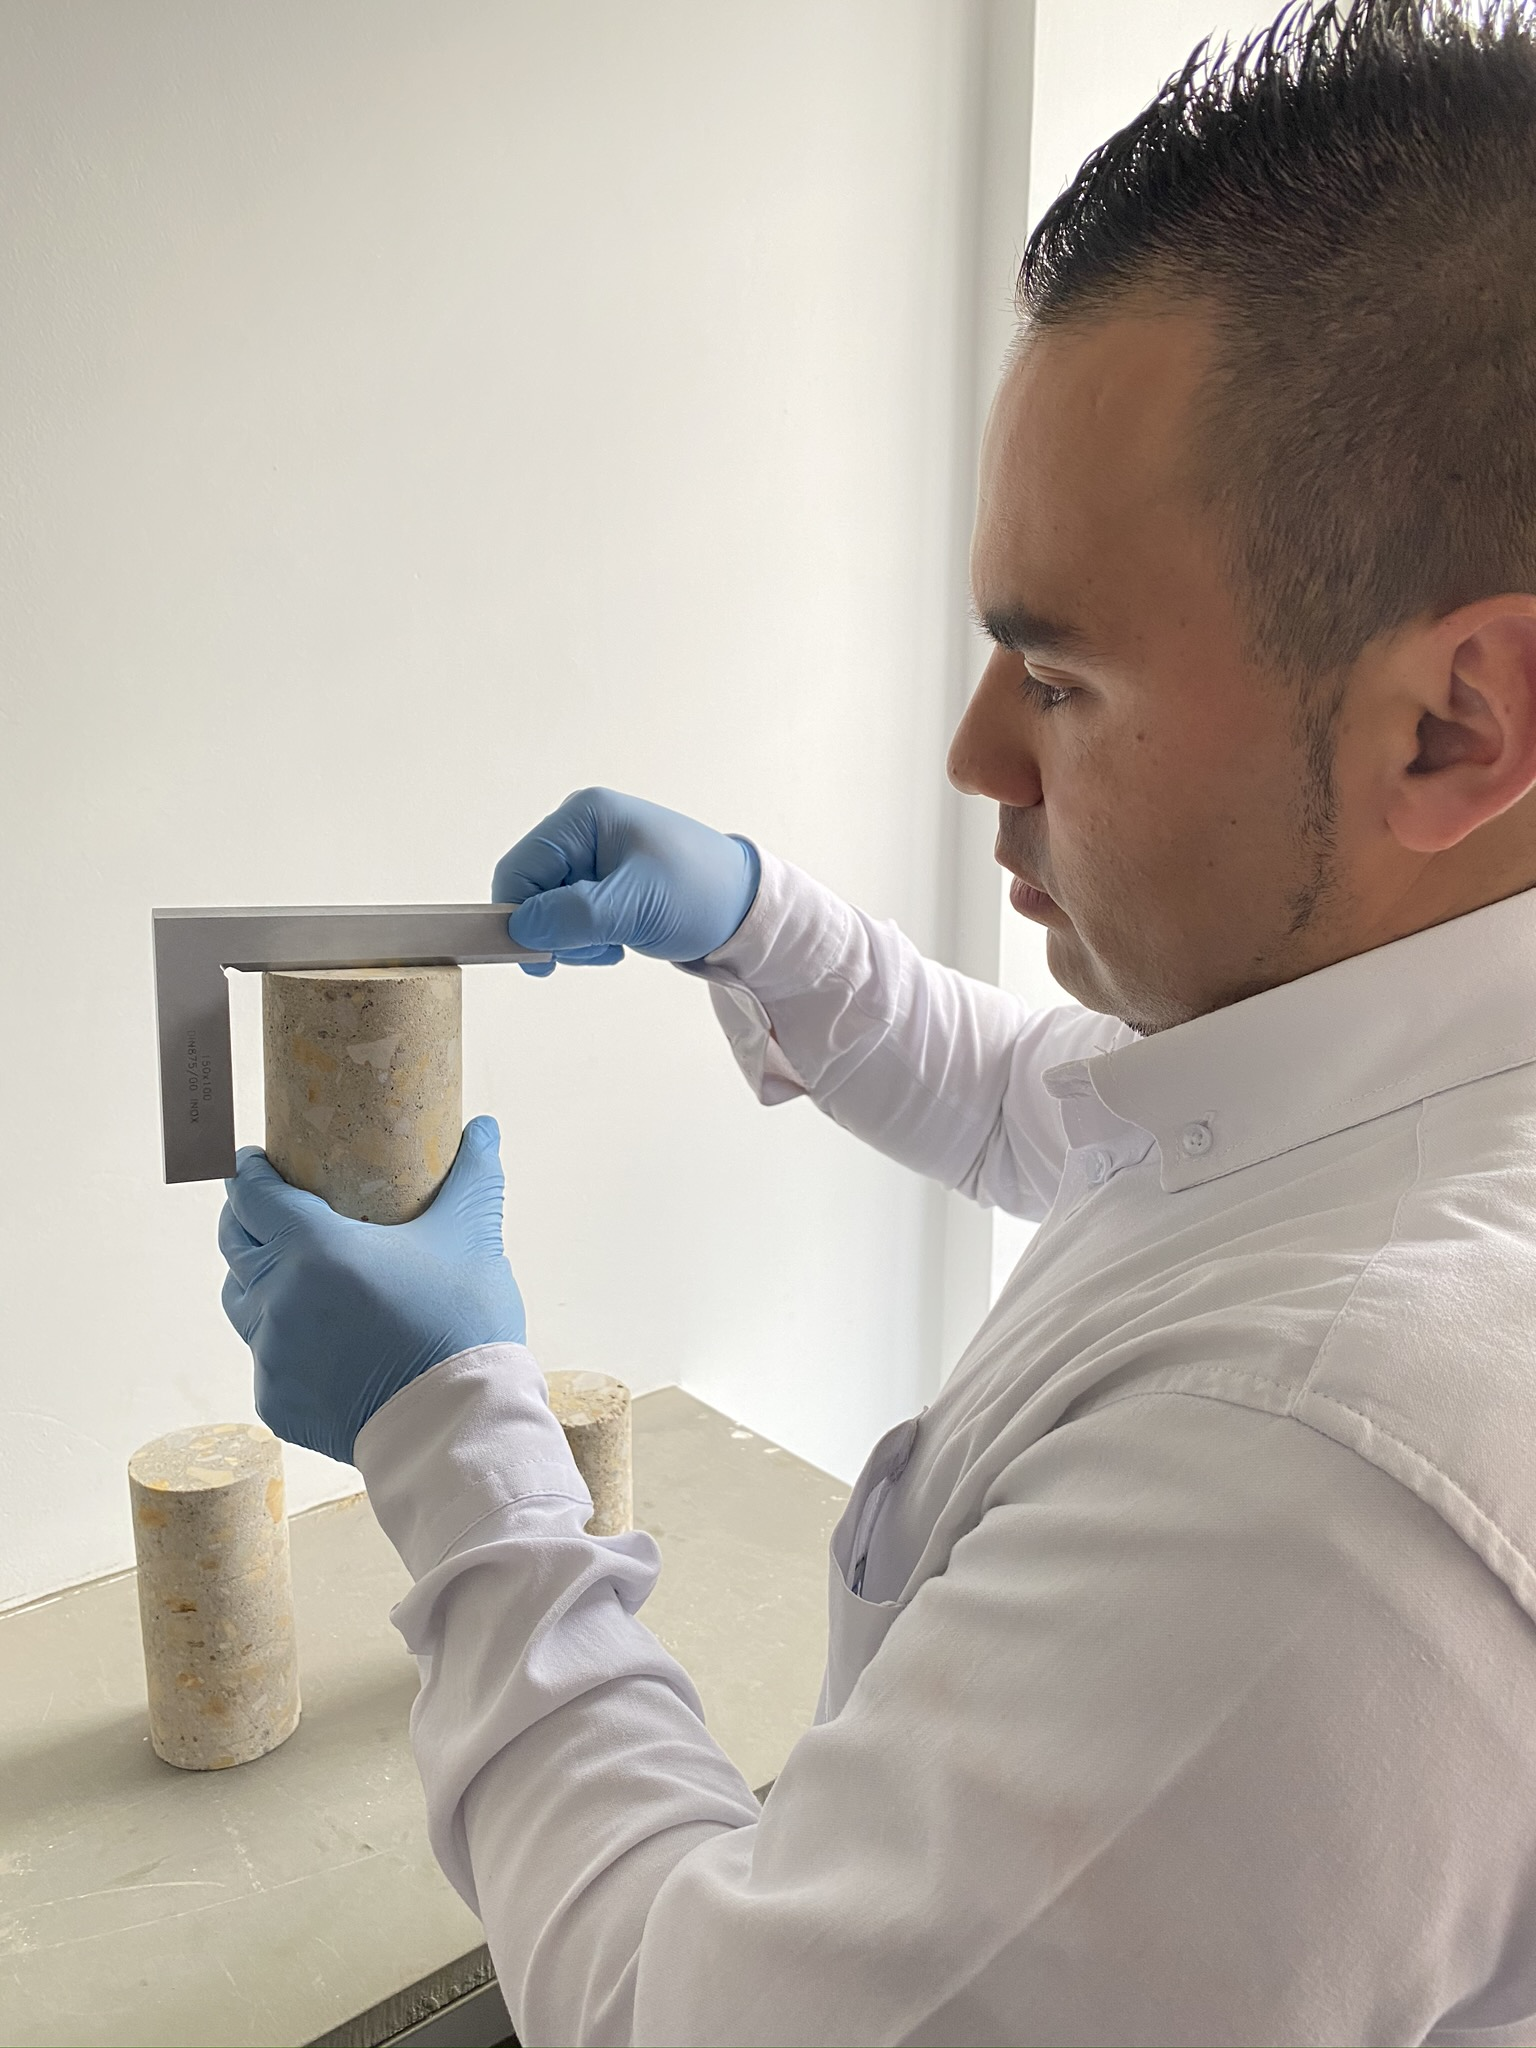 Como elaborar cilindros de concreto